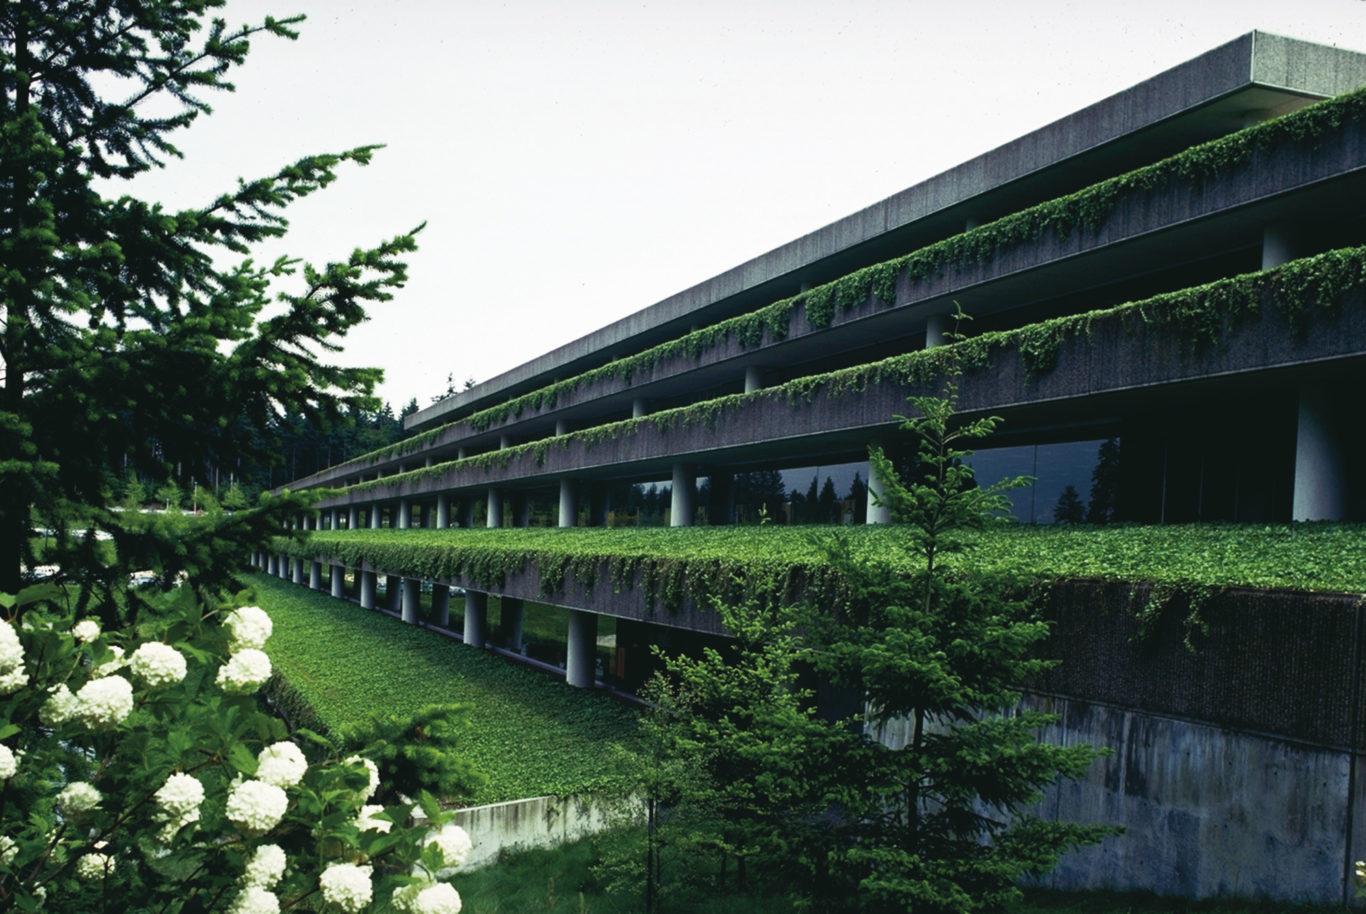 Slide 1 of 1, Weyerhauser headquarters